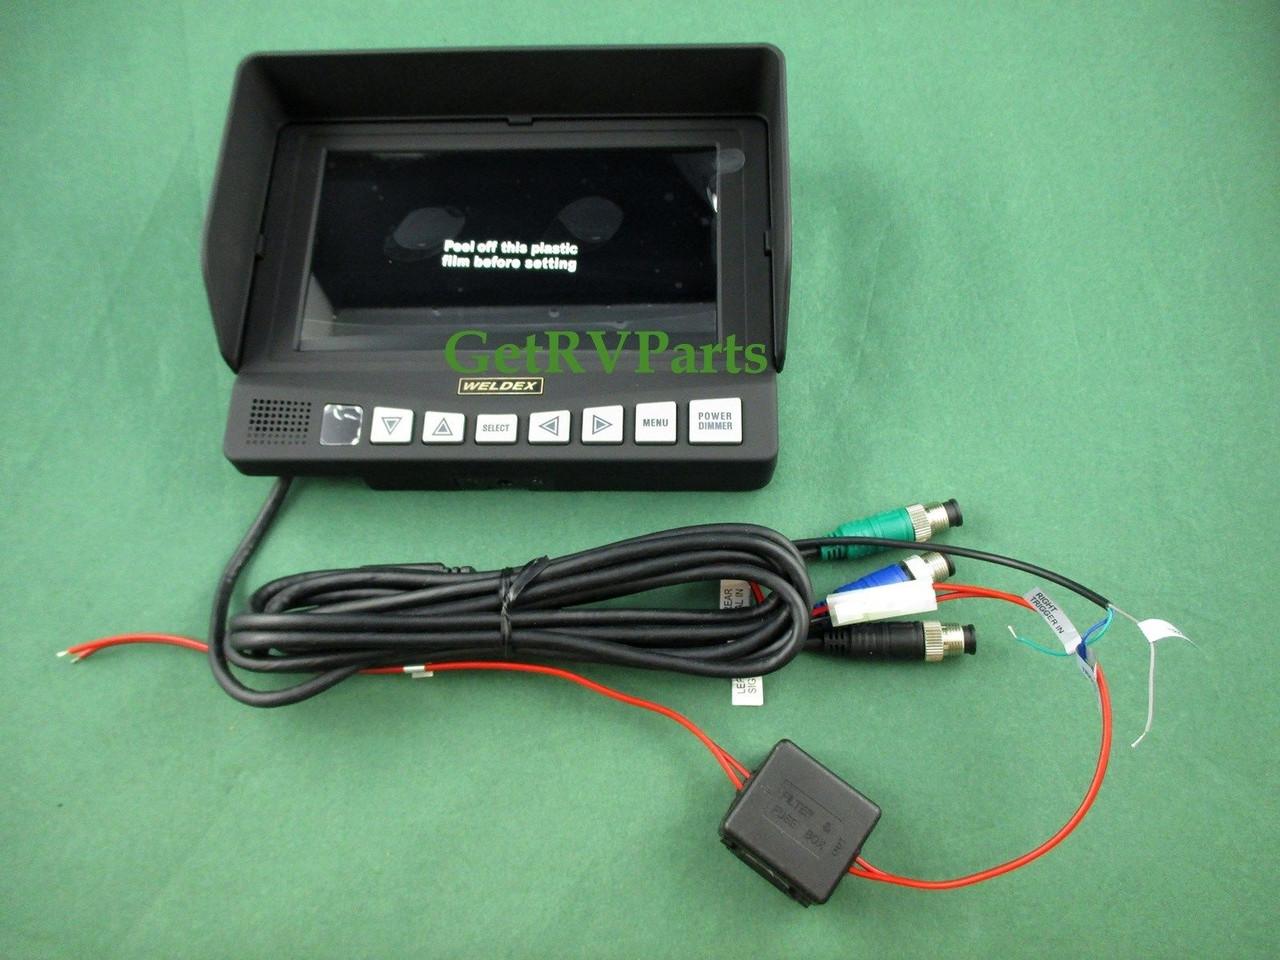 weldex wiring diagram weldex rv 7  rear view monitor system wdrv 7063 motorized camera  weldex rv 7  rear view monitor system